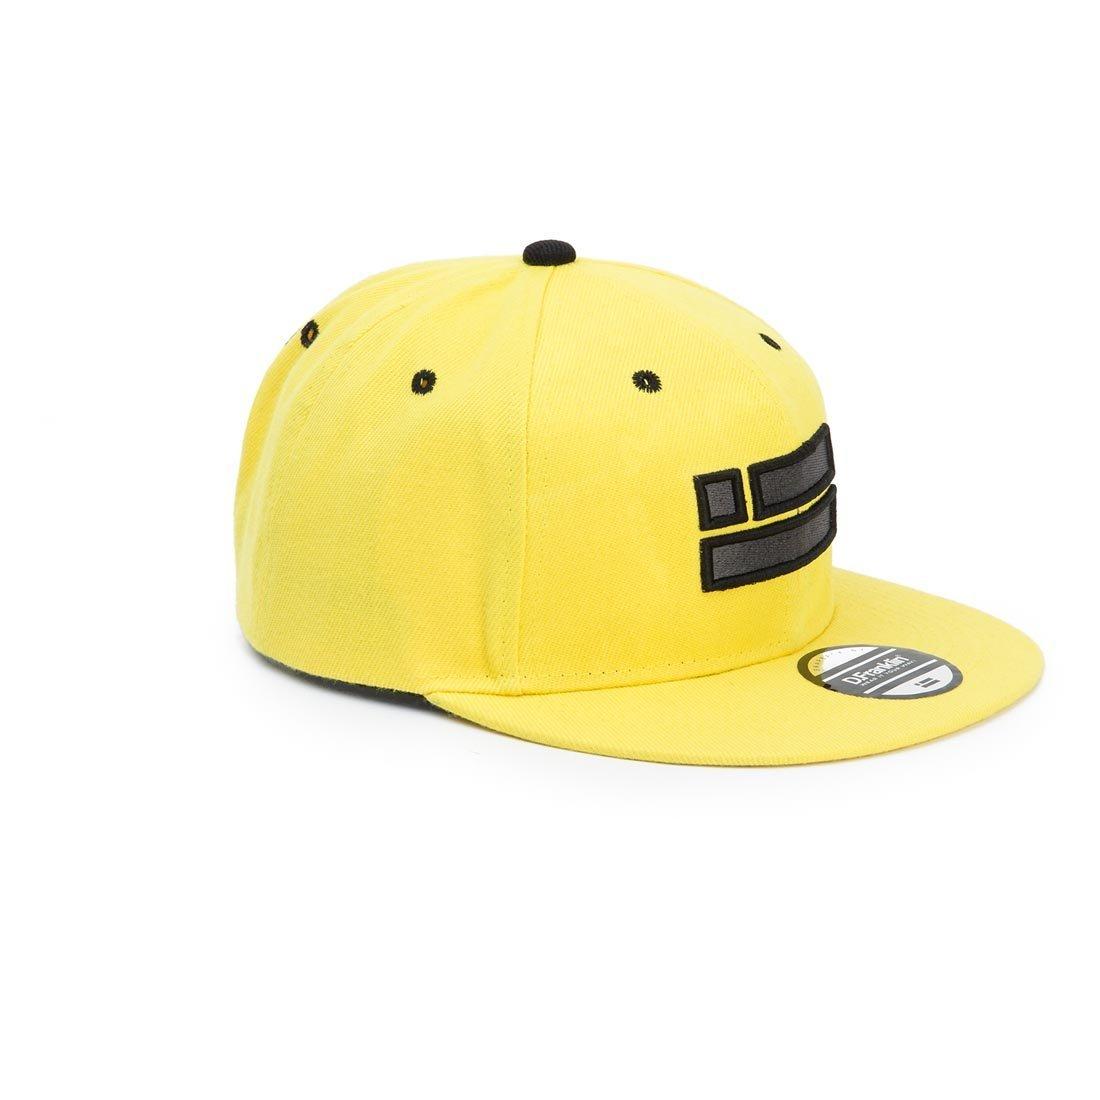 Yellow Chrome Snapback Cap D.Franklin lZawlF